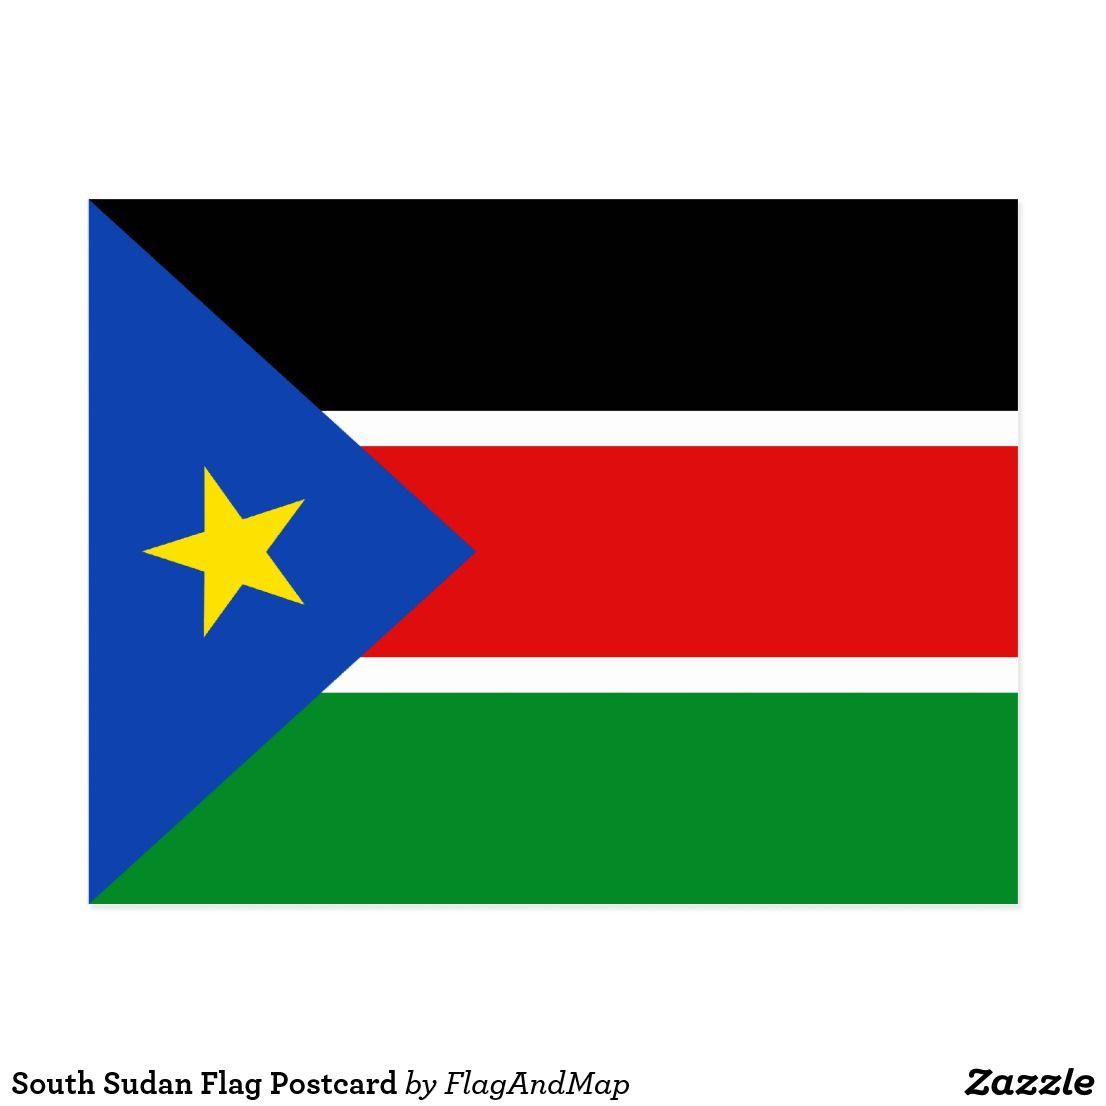 South Sudan Flag Postcard Zazzle Com South Sudan Flag Sudan